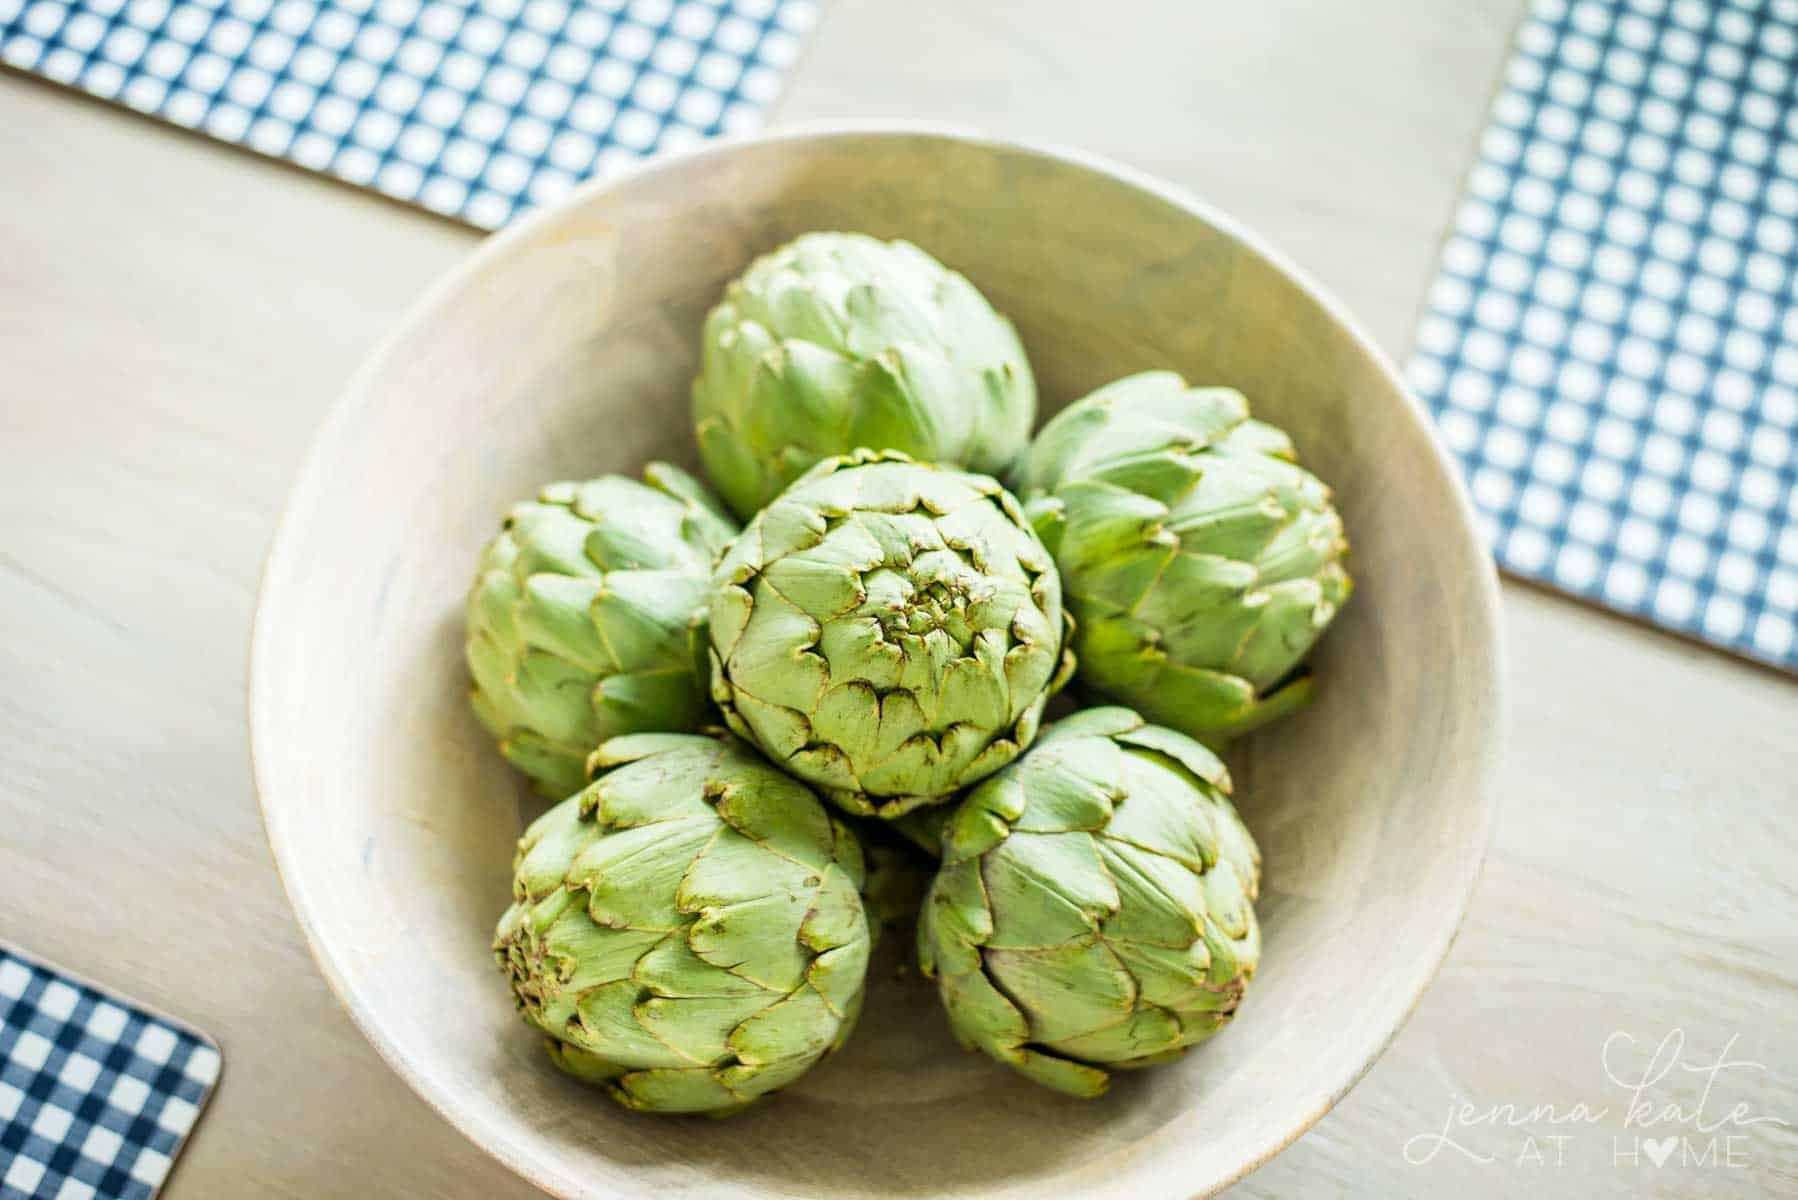 a bowl full of fresh artichokes as a spring table centerpiece